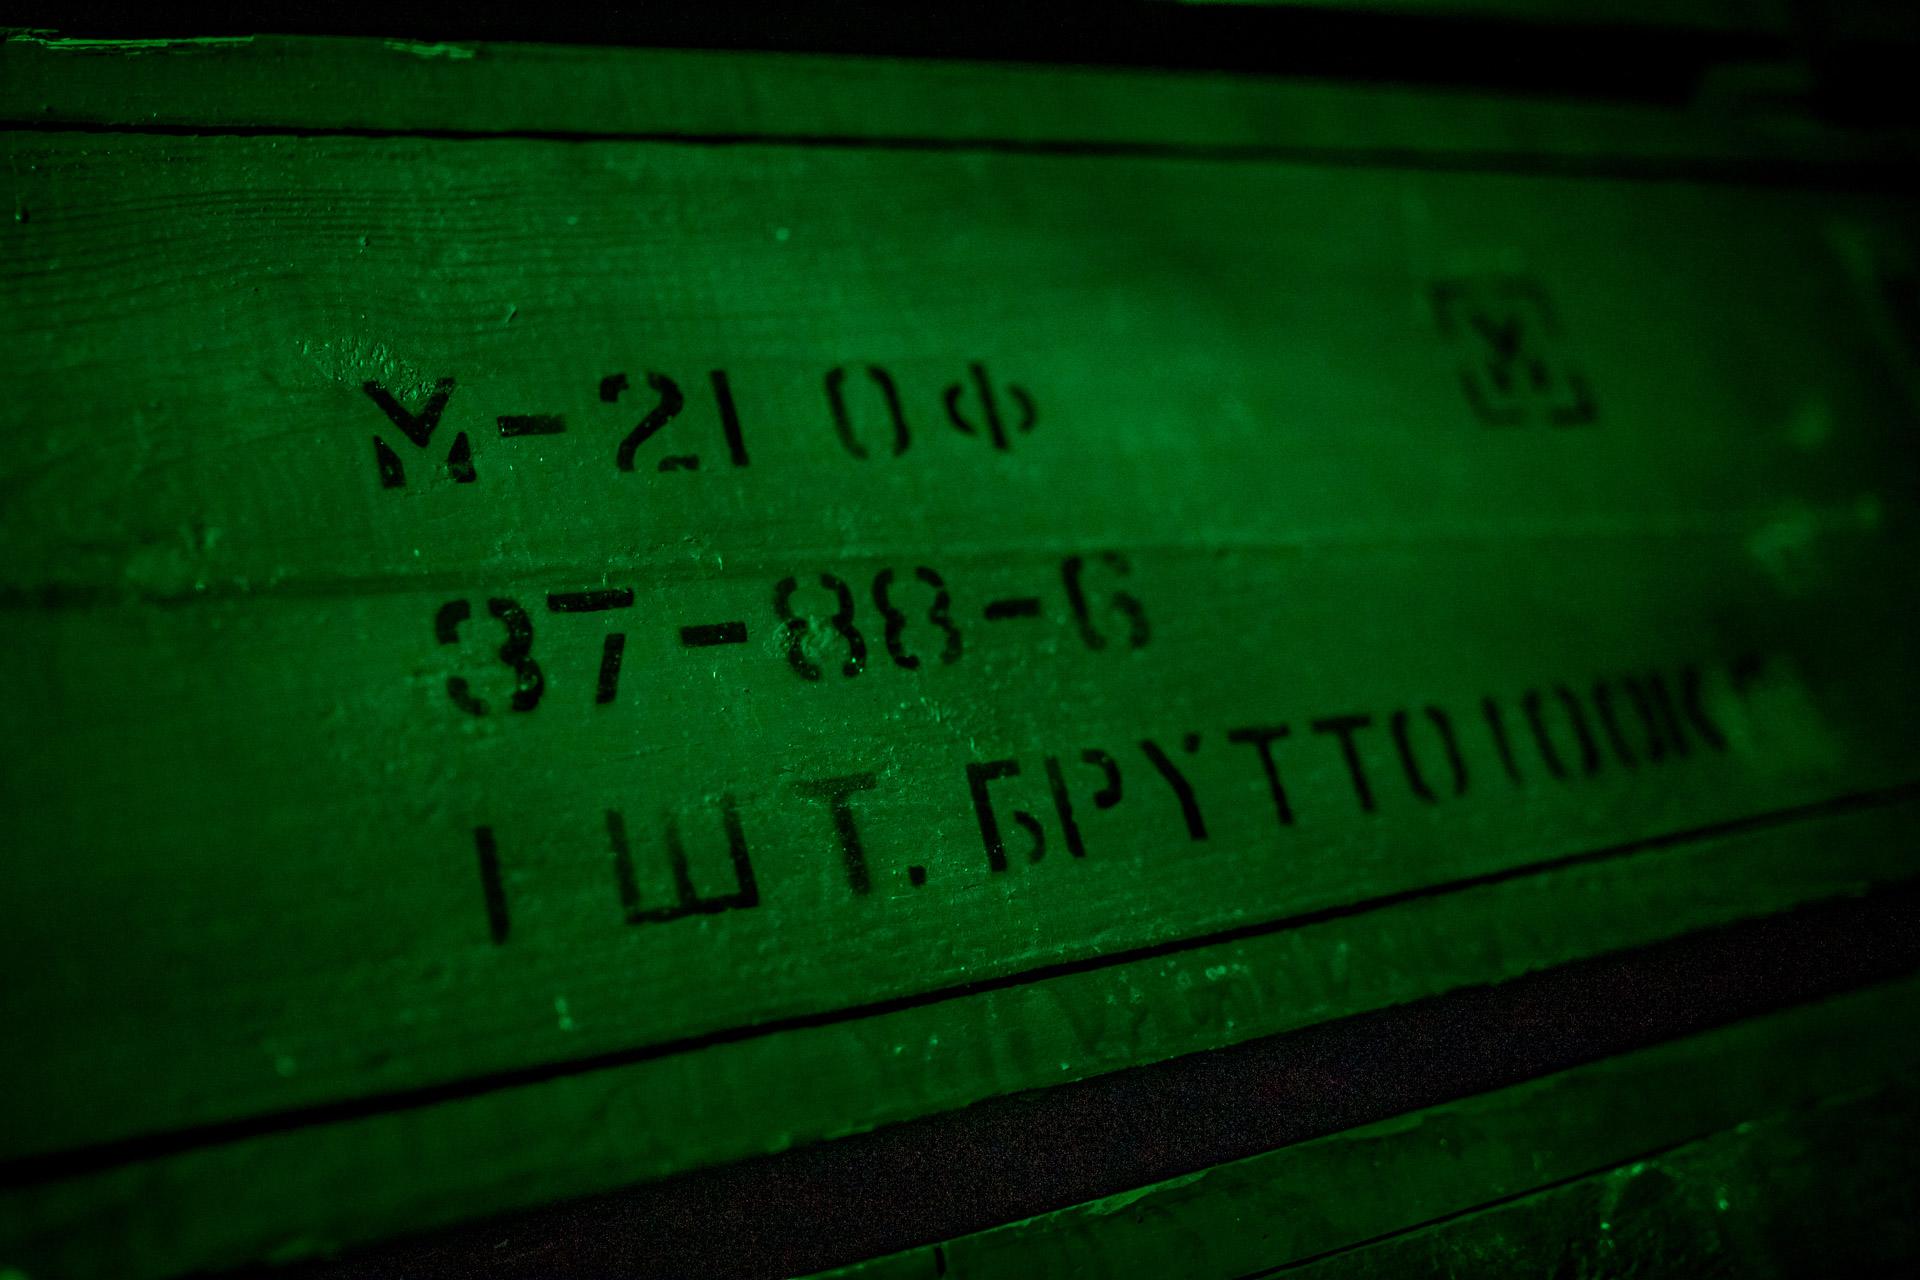 LOGIC-52